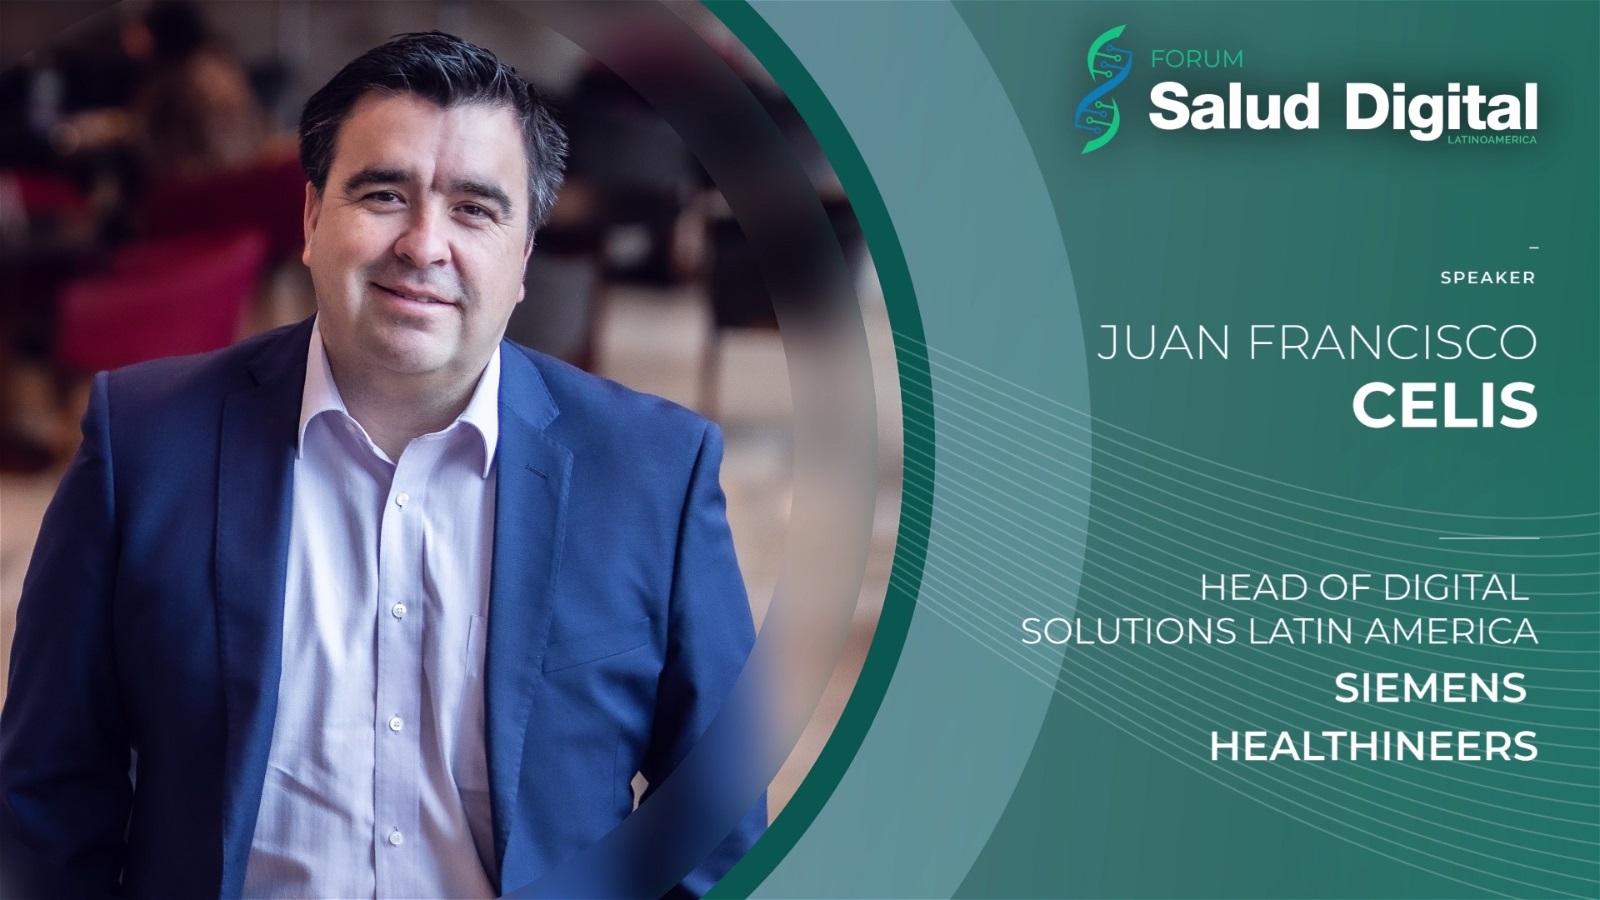 Forum Salud Digital -